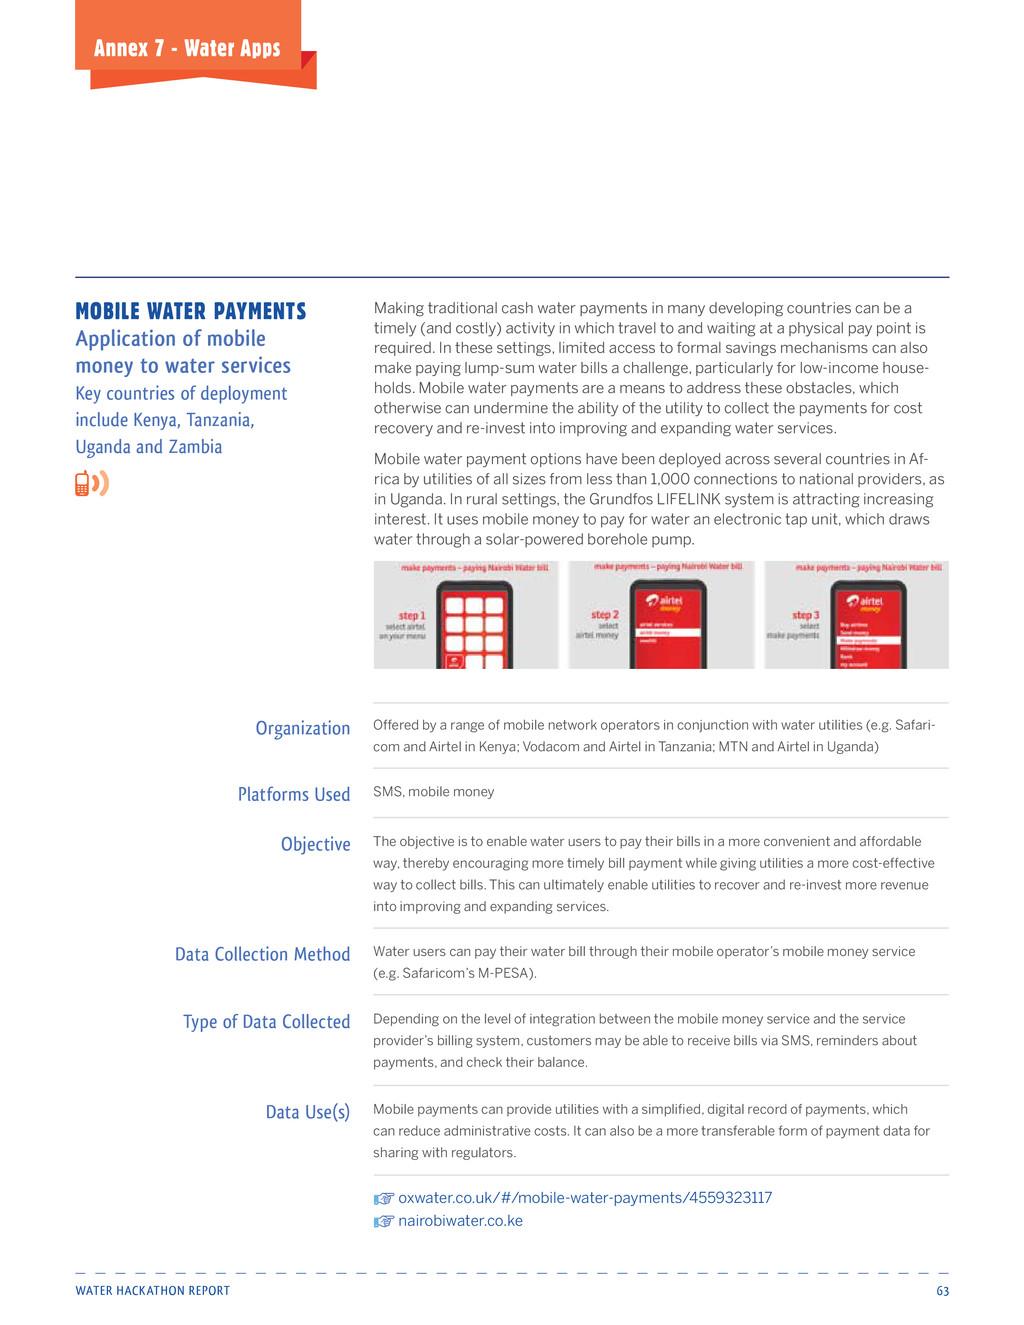 Water HackatHon report 63 Annex 7 - water Apps ...